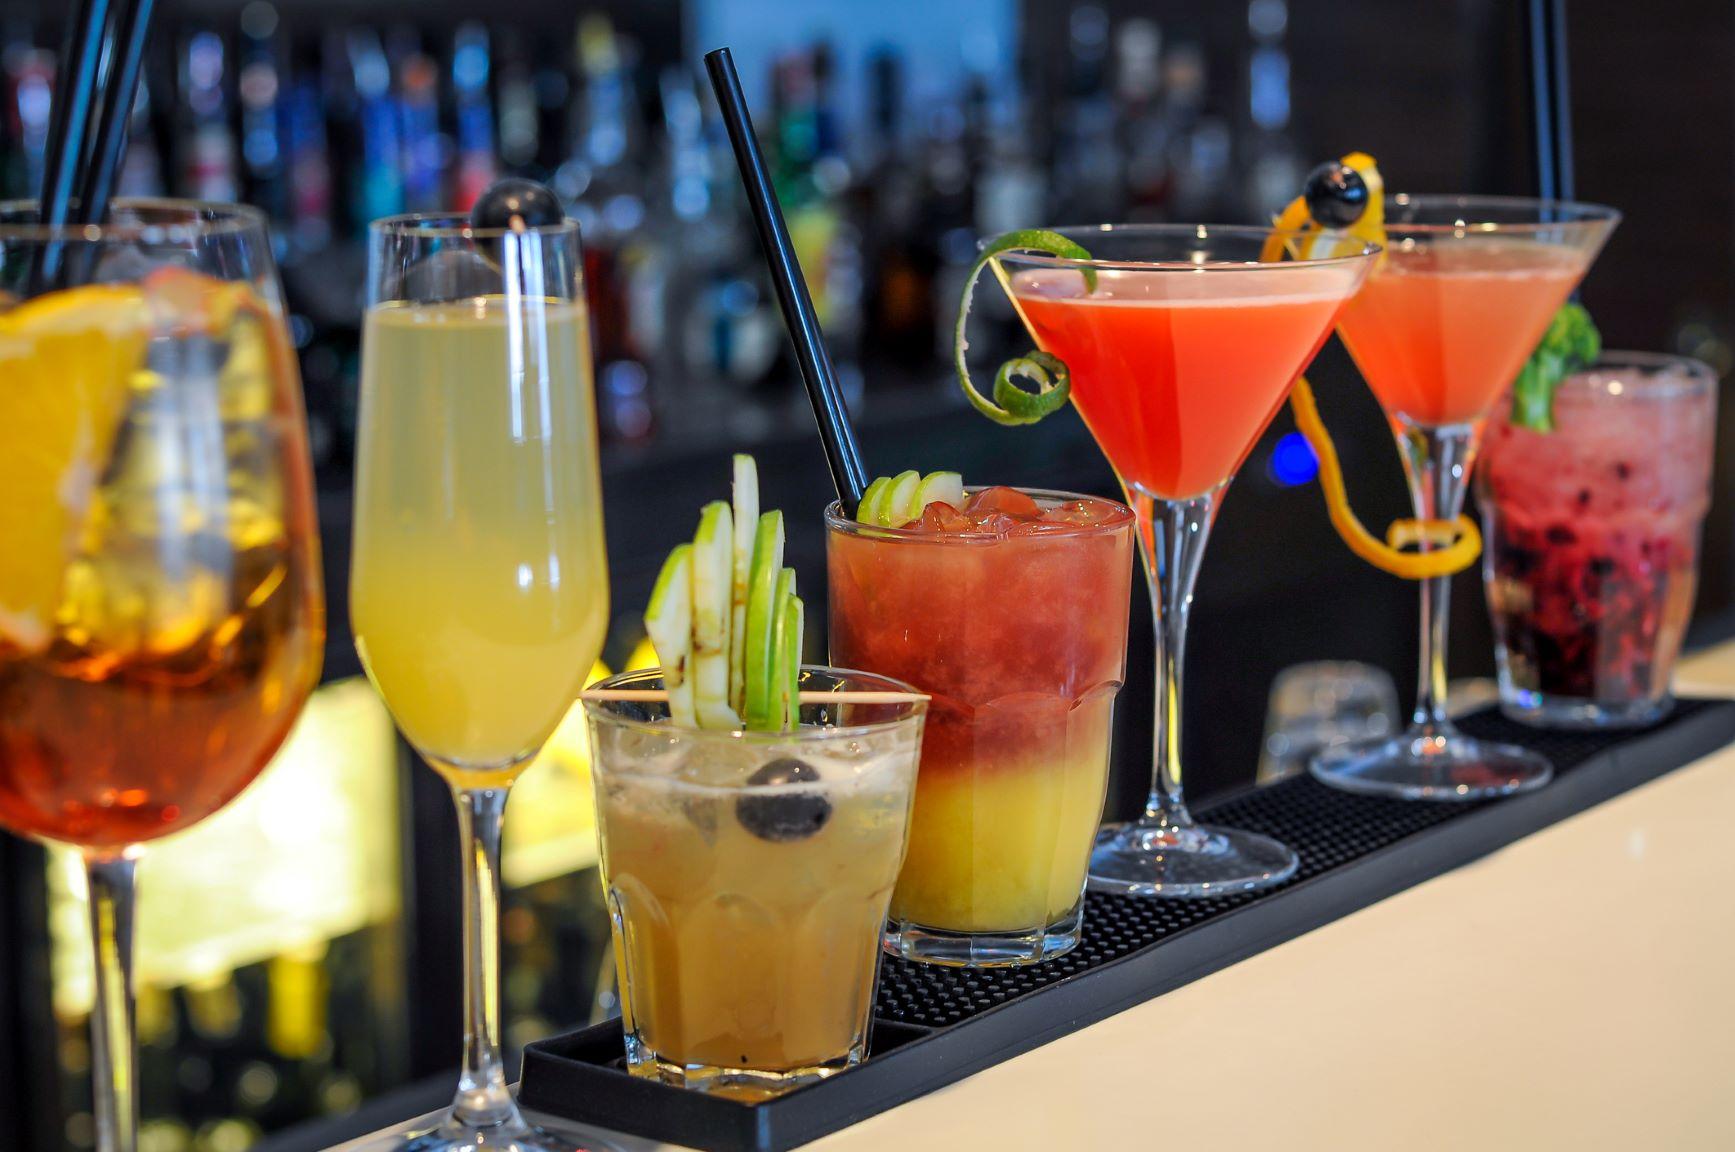 4 Steps to Stocking a Kombucha-Based Bar